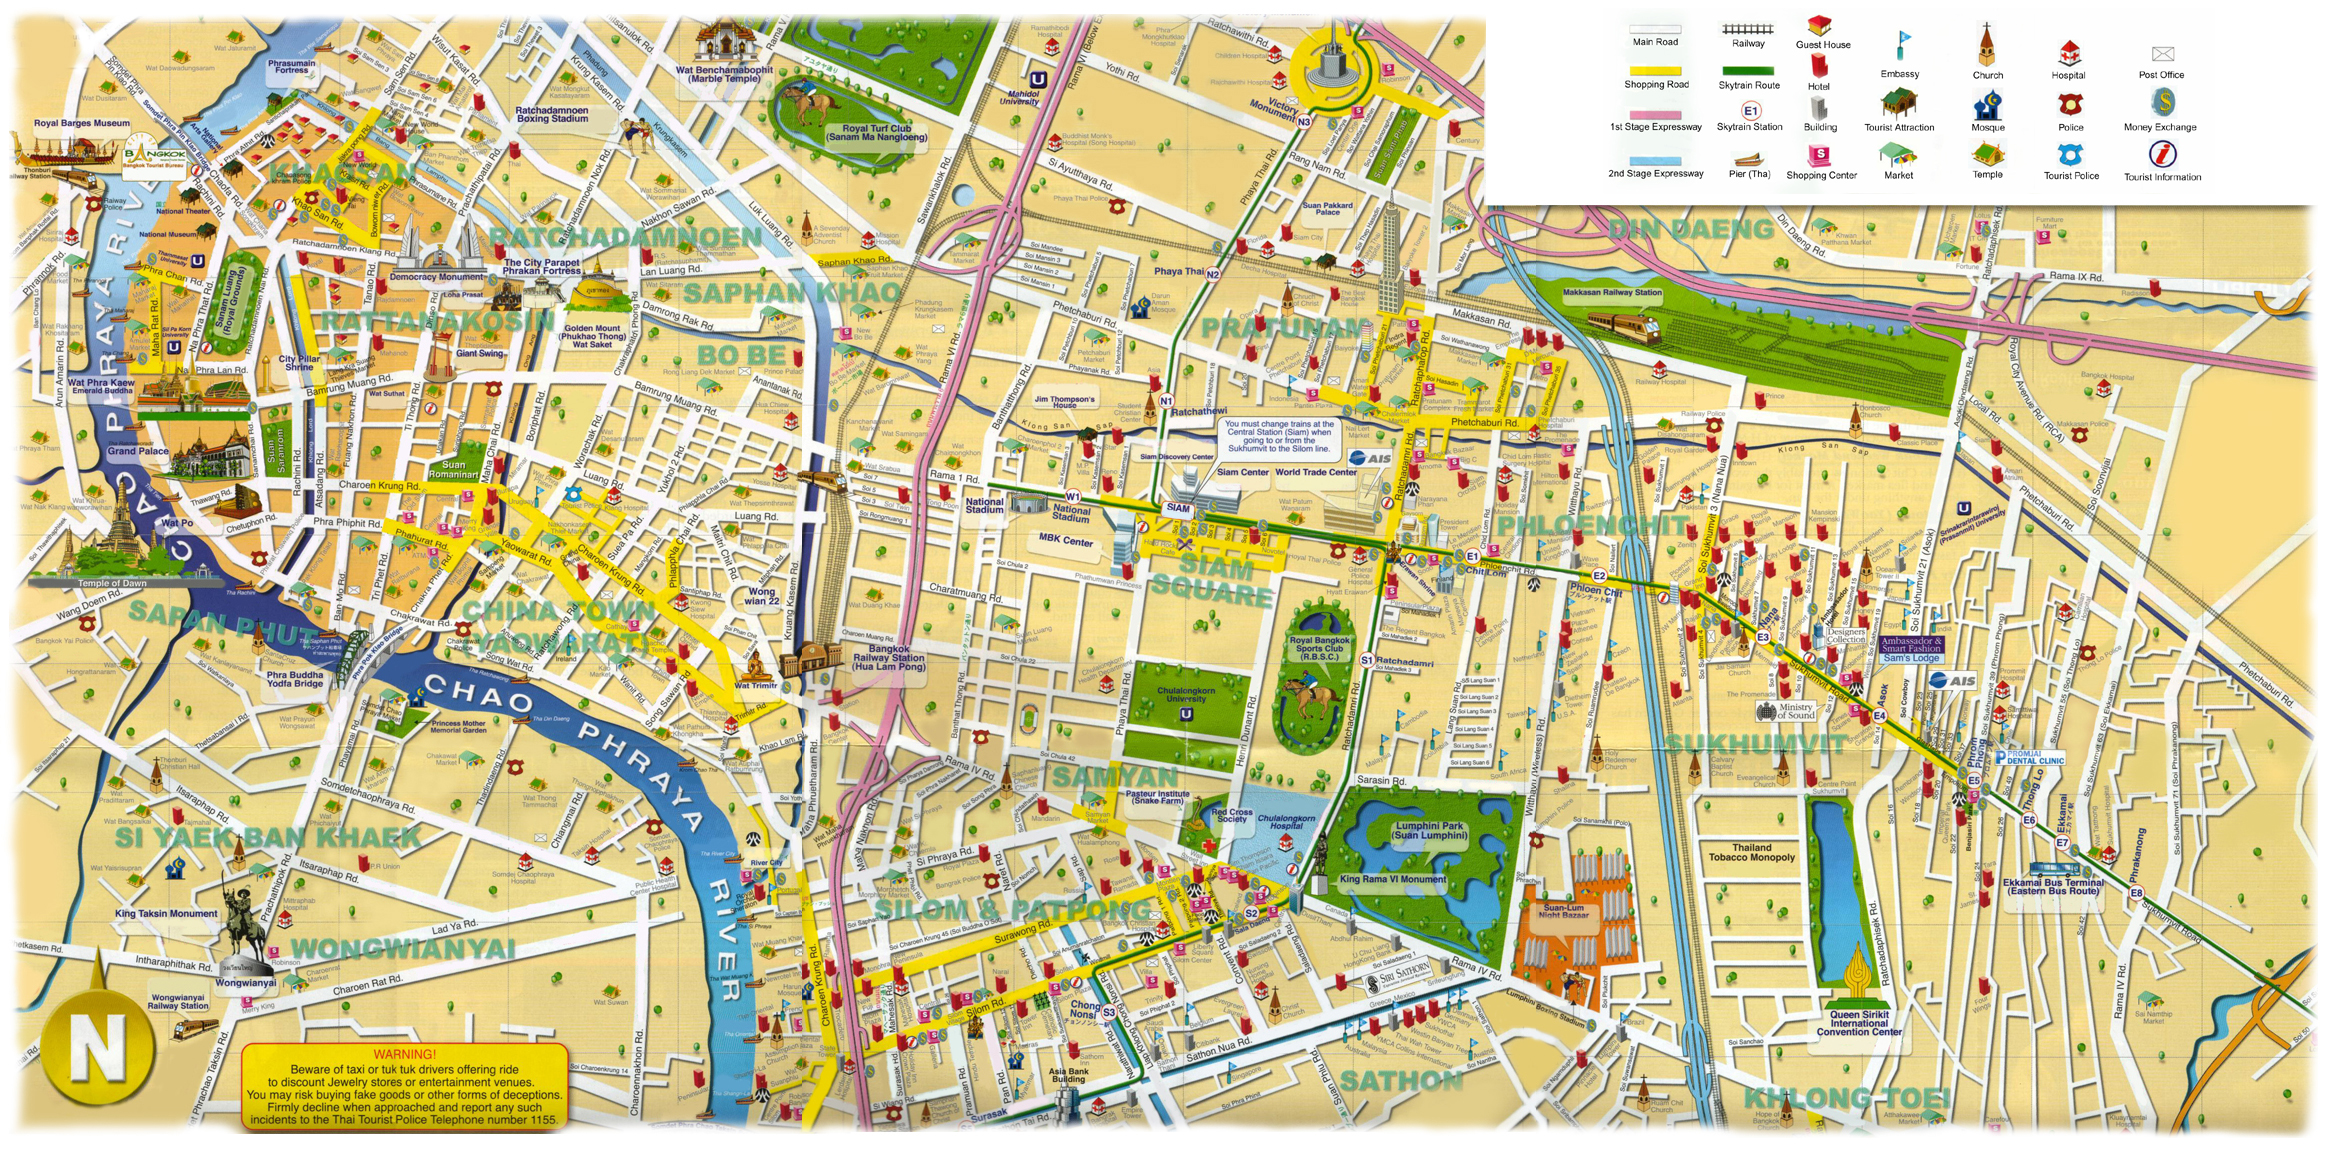 carte_bangkok_avec_les_monuments_importants.jpg